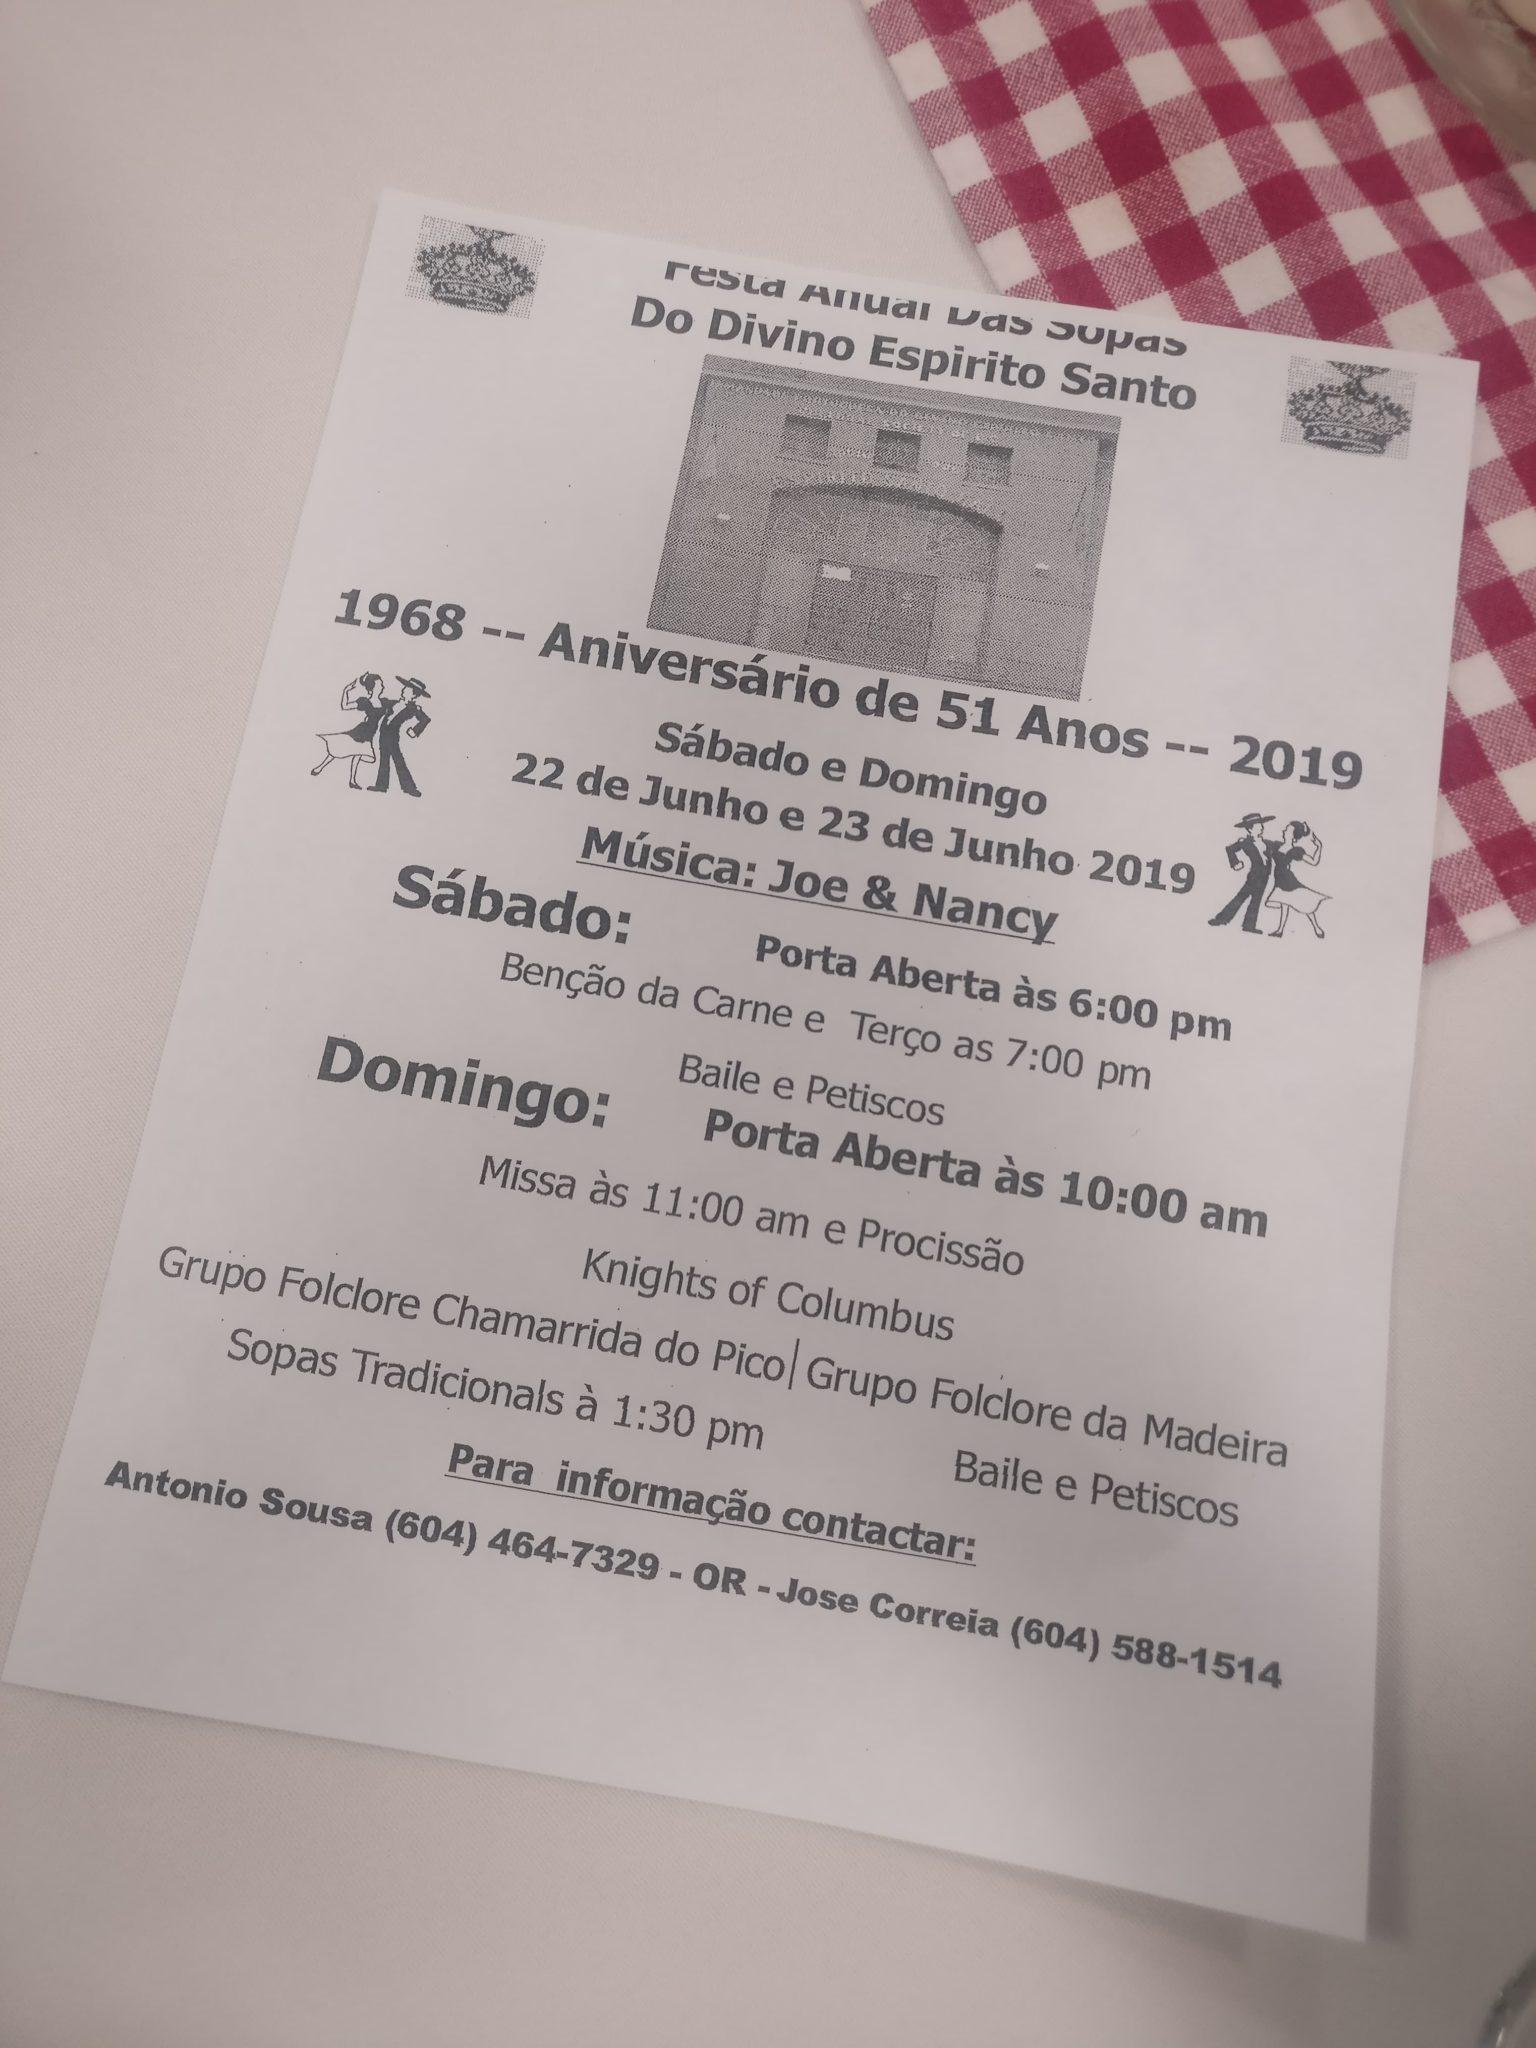 Festa Anual Das Sopas e Aniversário de 51 Anos, Espirito Santo Hall, Irmandade Portuguesa Do Divino Espirito Santo Cultural Society of BC